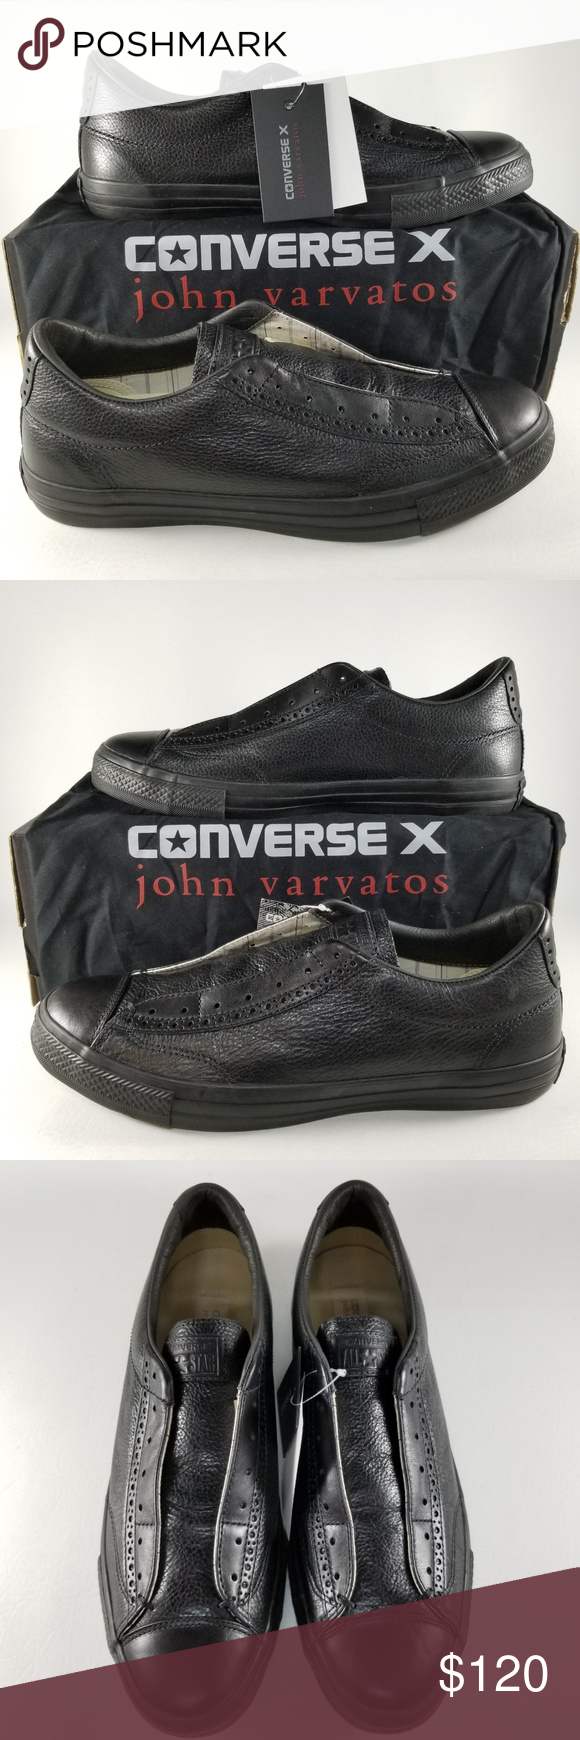 daea409ed595 Converse X John Varvatos CTAS Vintage Slip Mens 11 Converse X John Varvatos  CTAS Vintage Slip